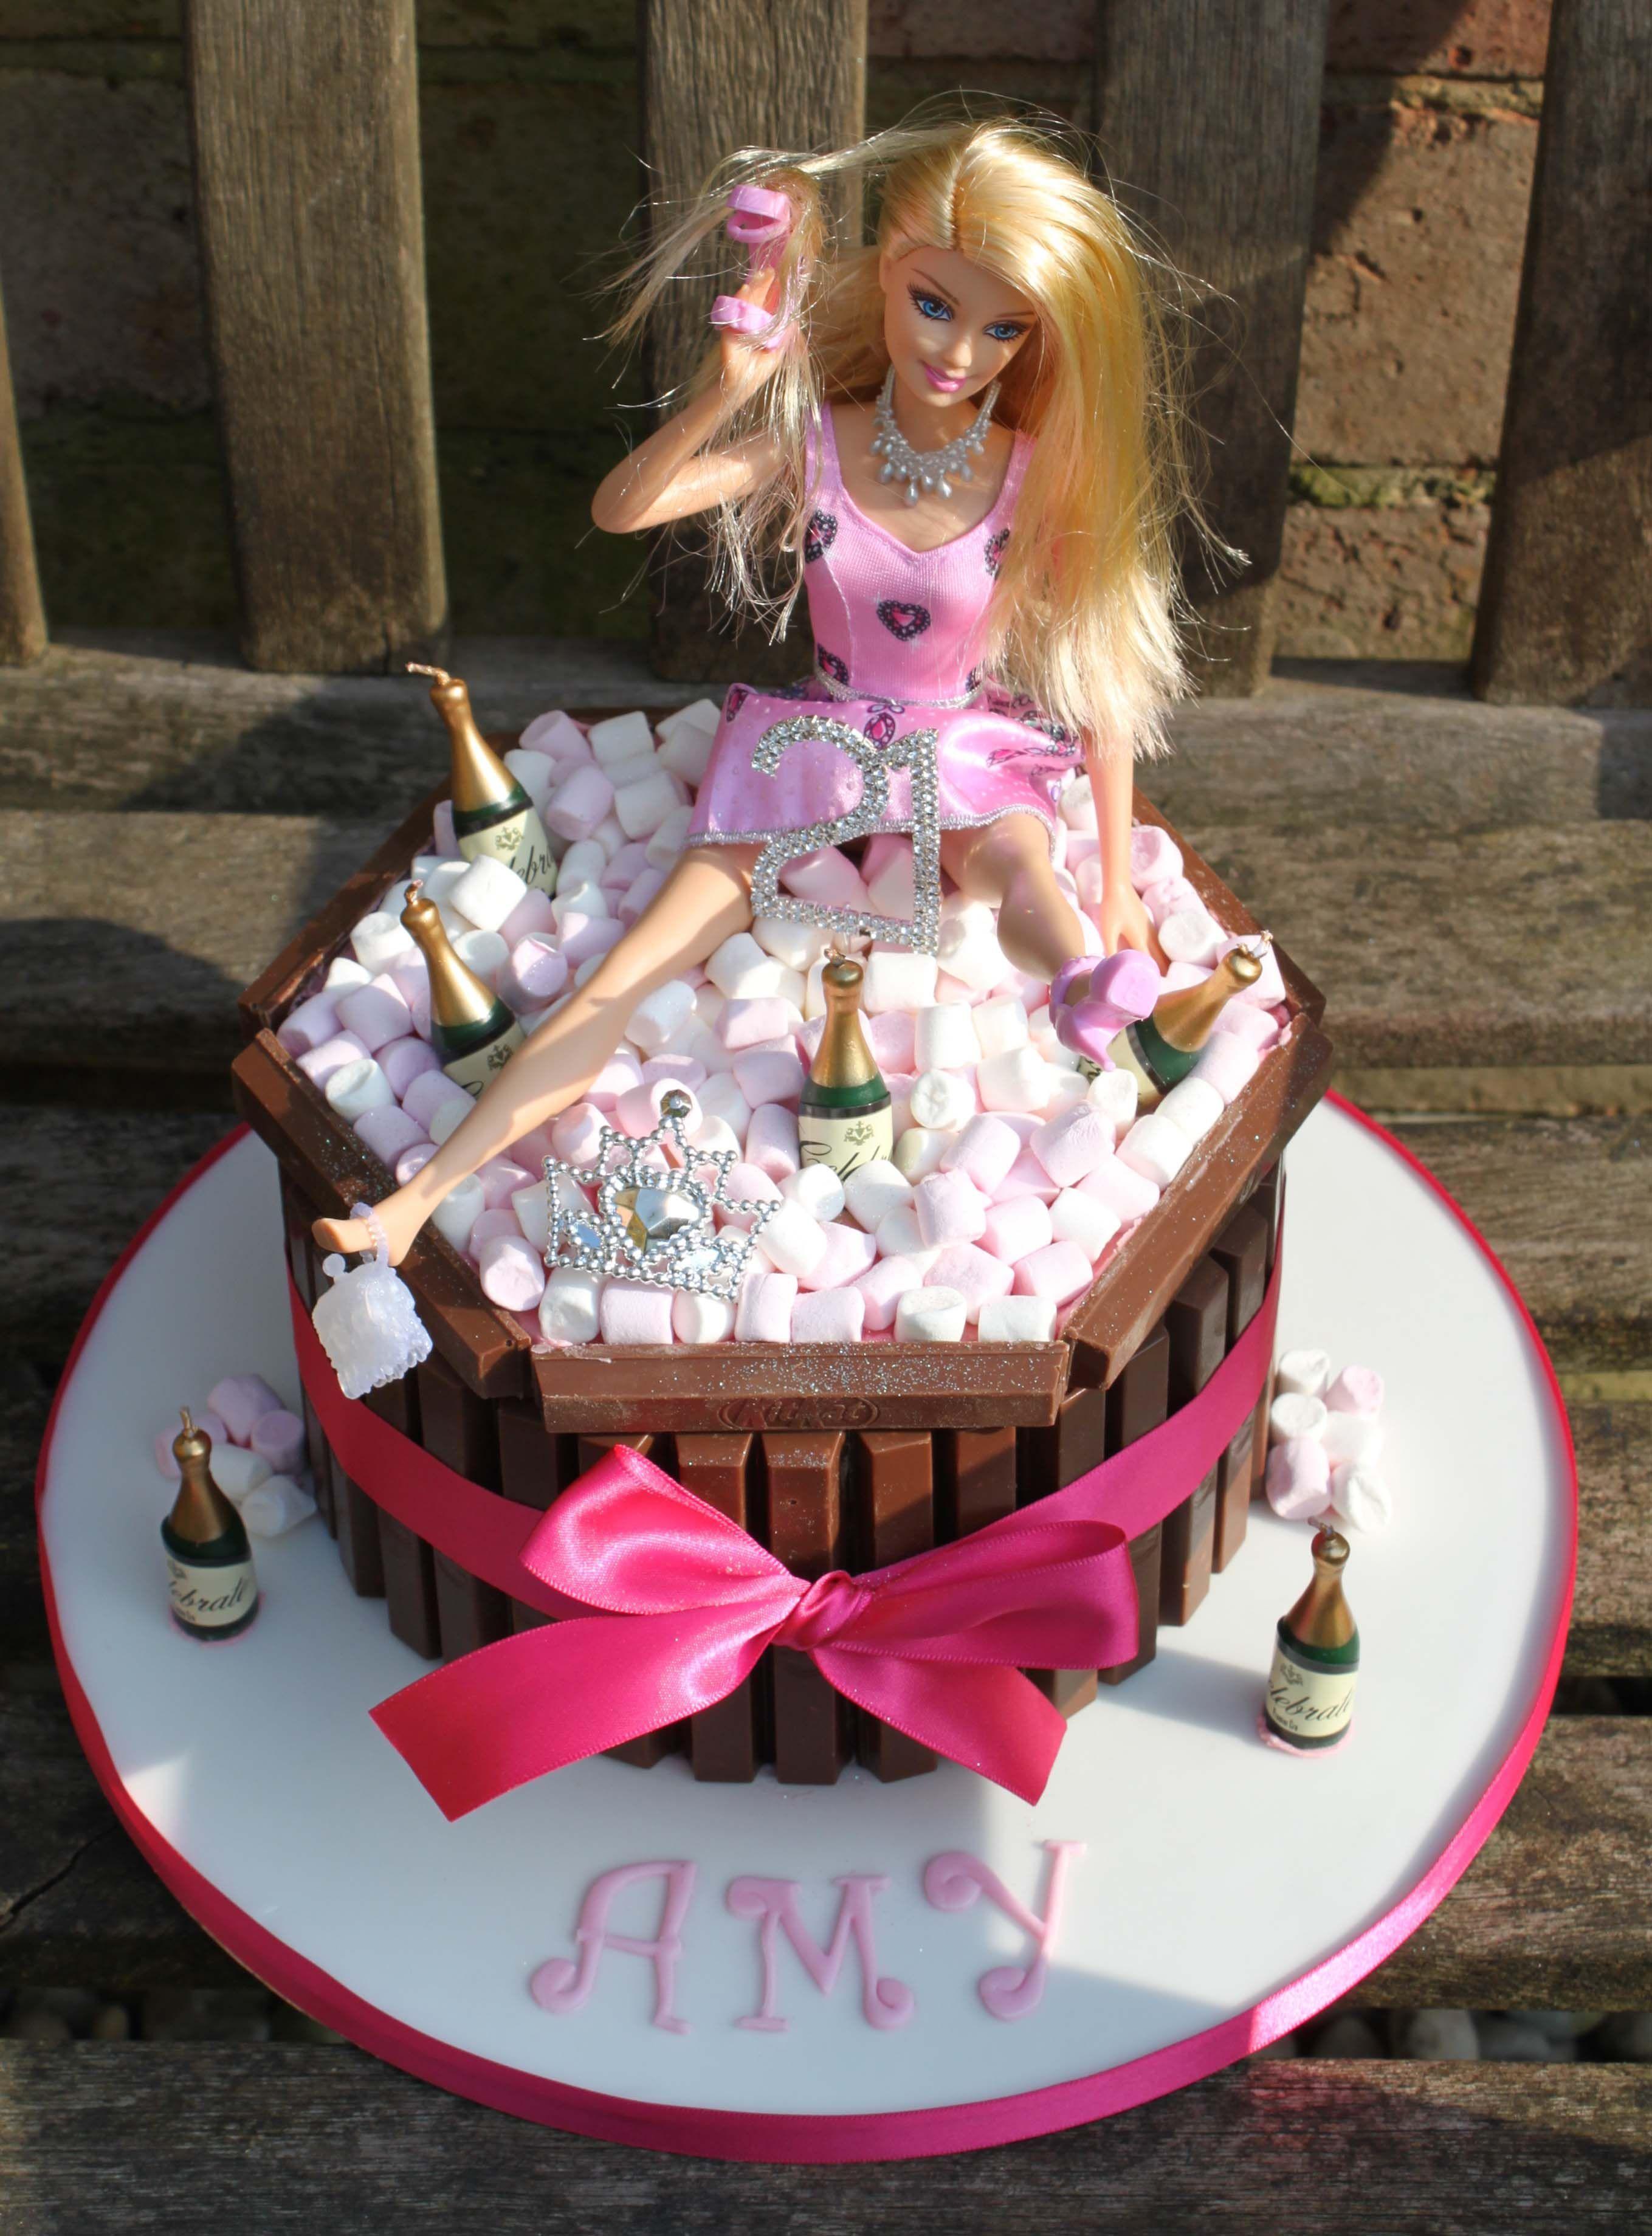 Drunken Barbie Cake Little Love Cakes London Tortas